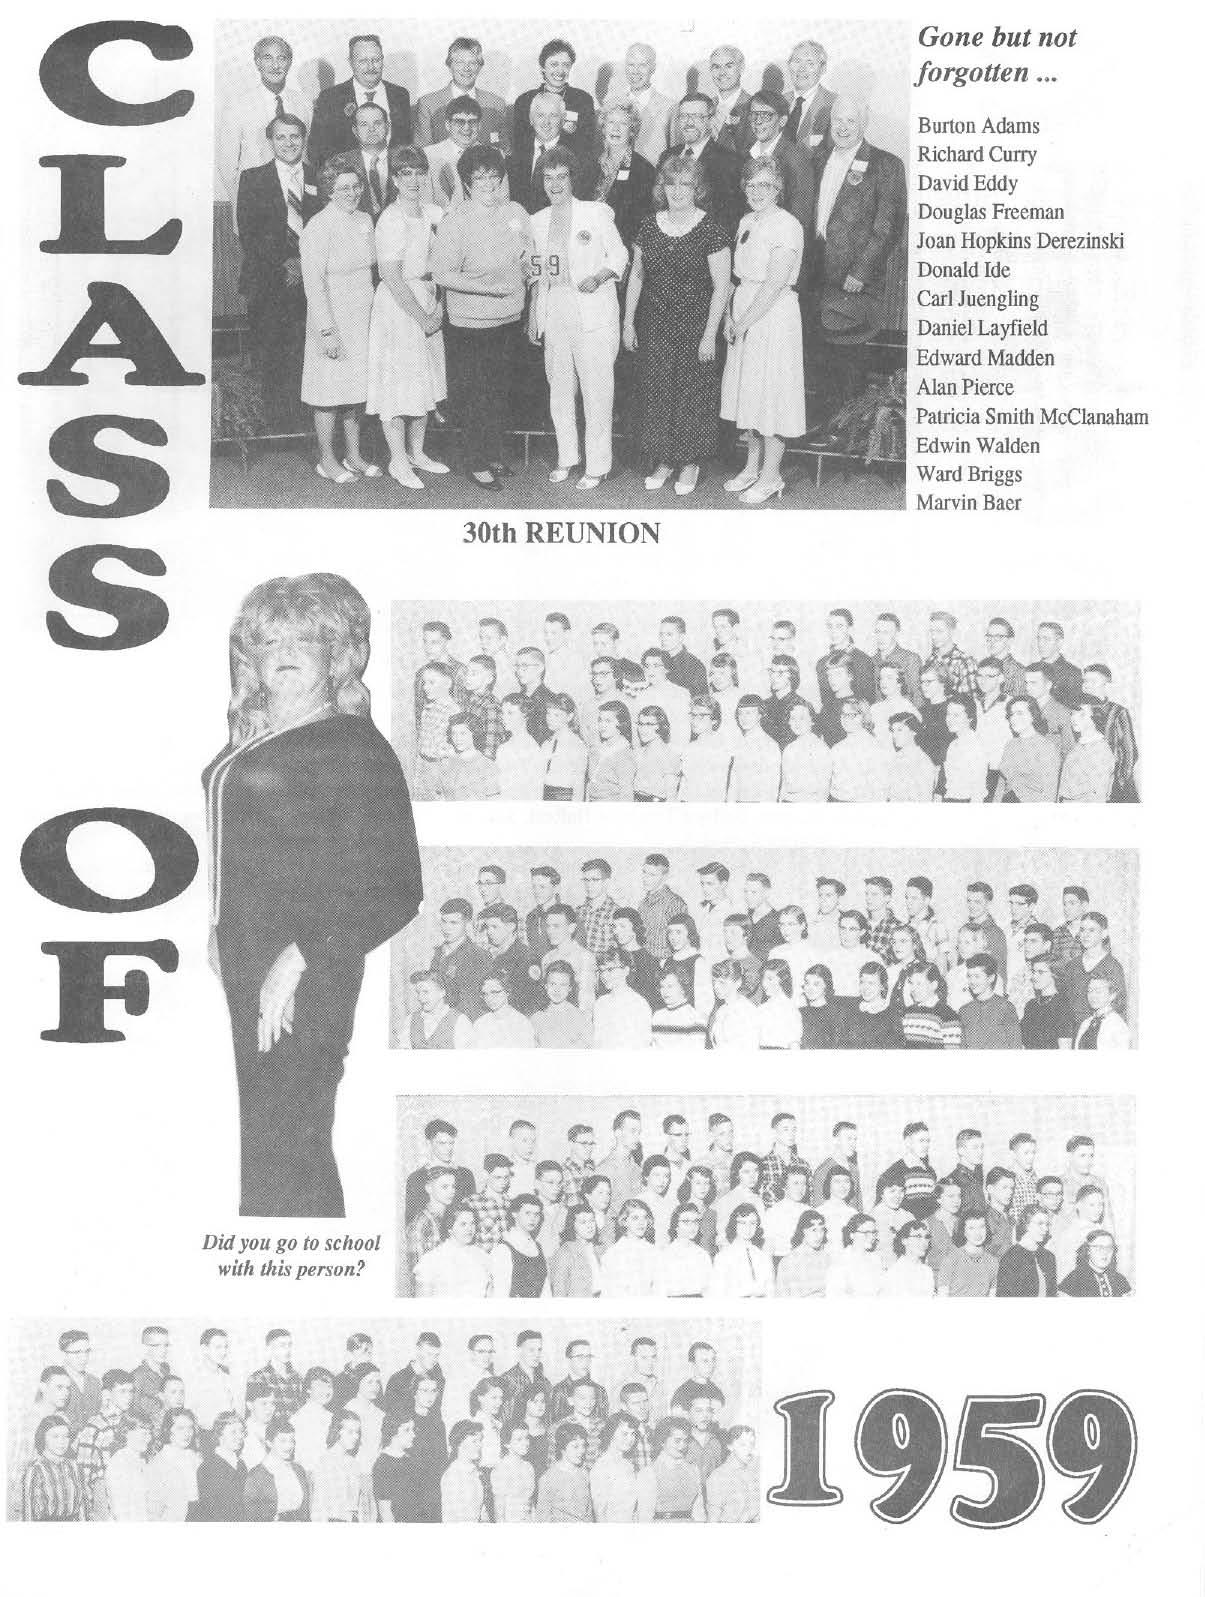 1994 1959